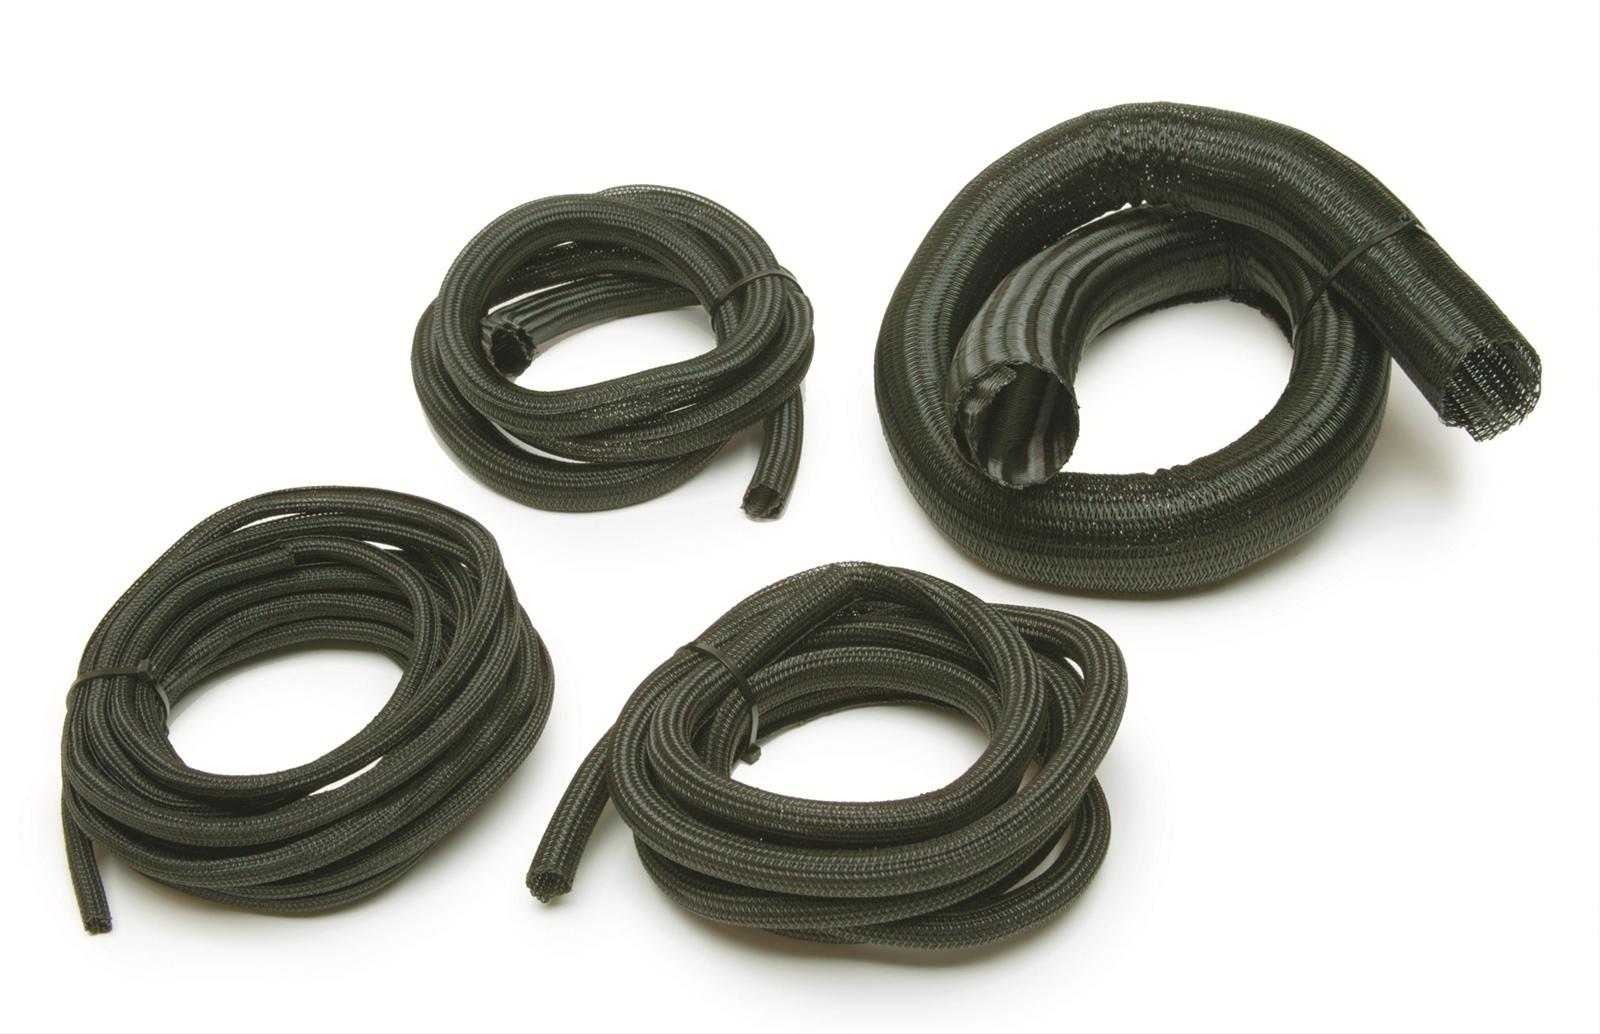 Wire loom classicbroncos forums